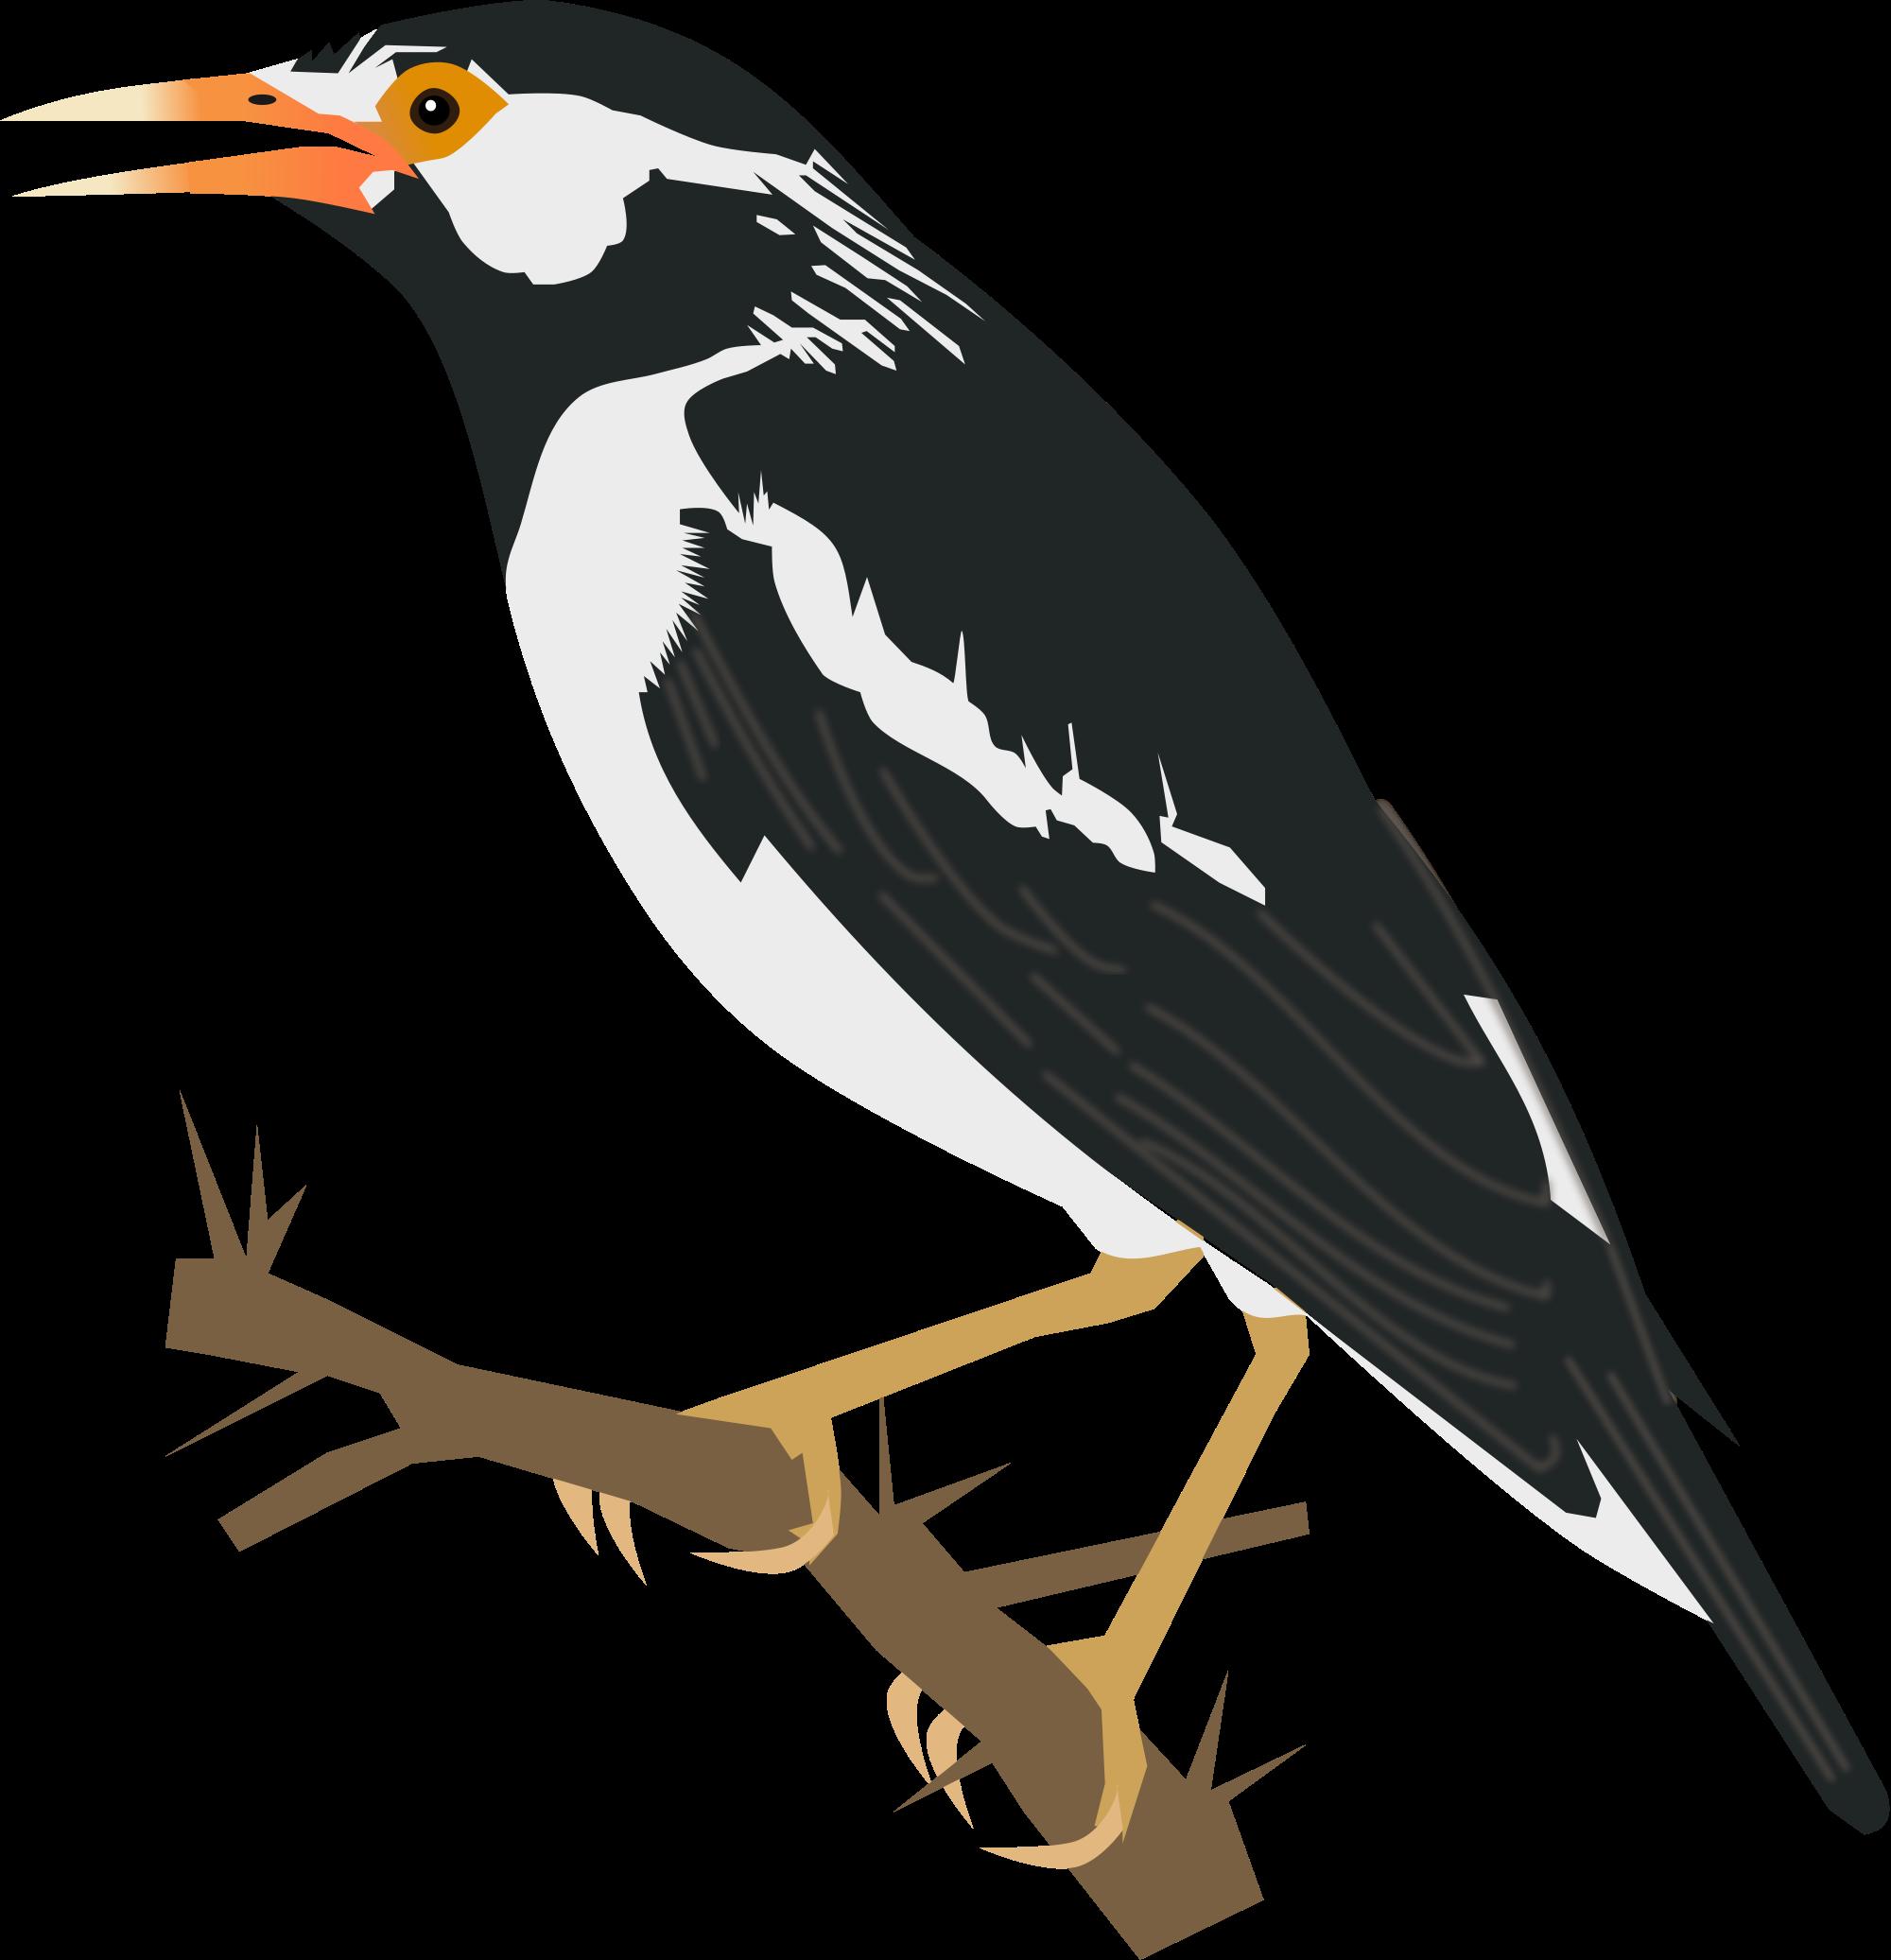 Brds clipart koyal Wikimedia Pied Starling File:Asian Open